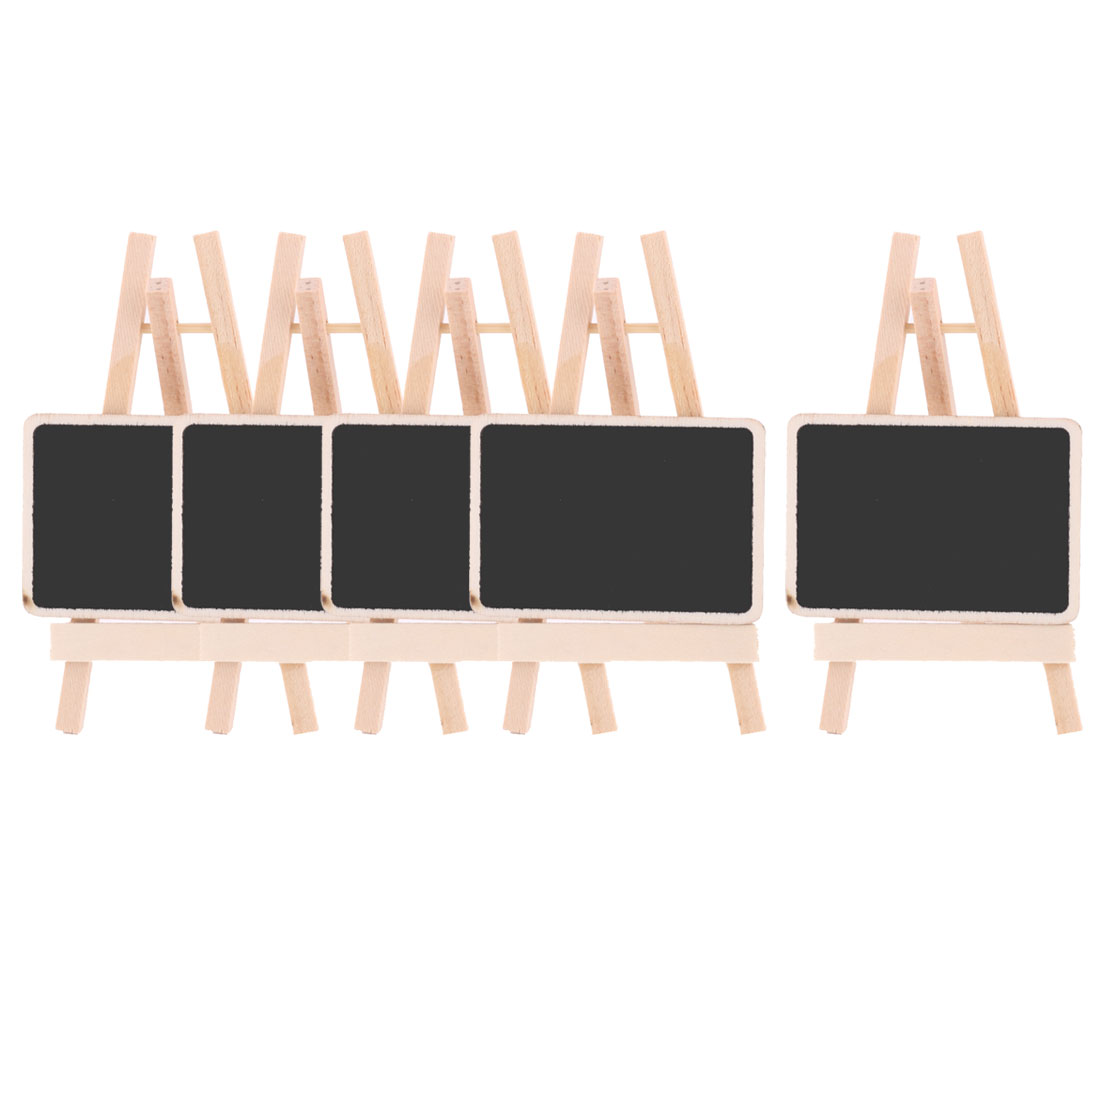 Feast Wood Rectangle DIY Standing Message Memo Blackboard 4.7 Inch Height 5pcs